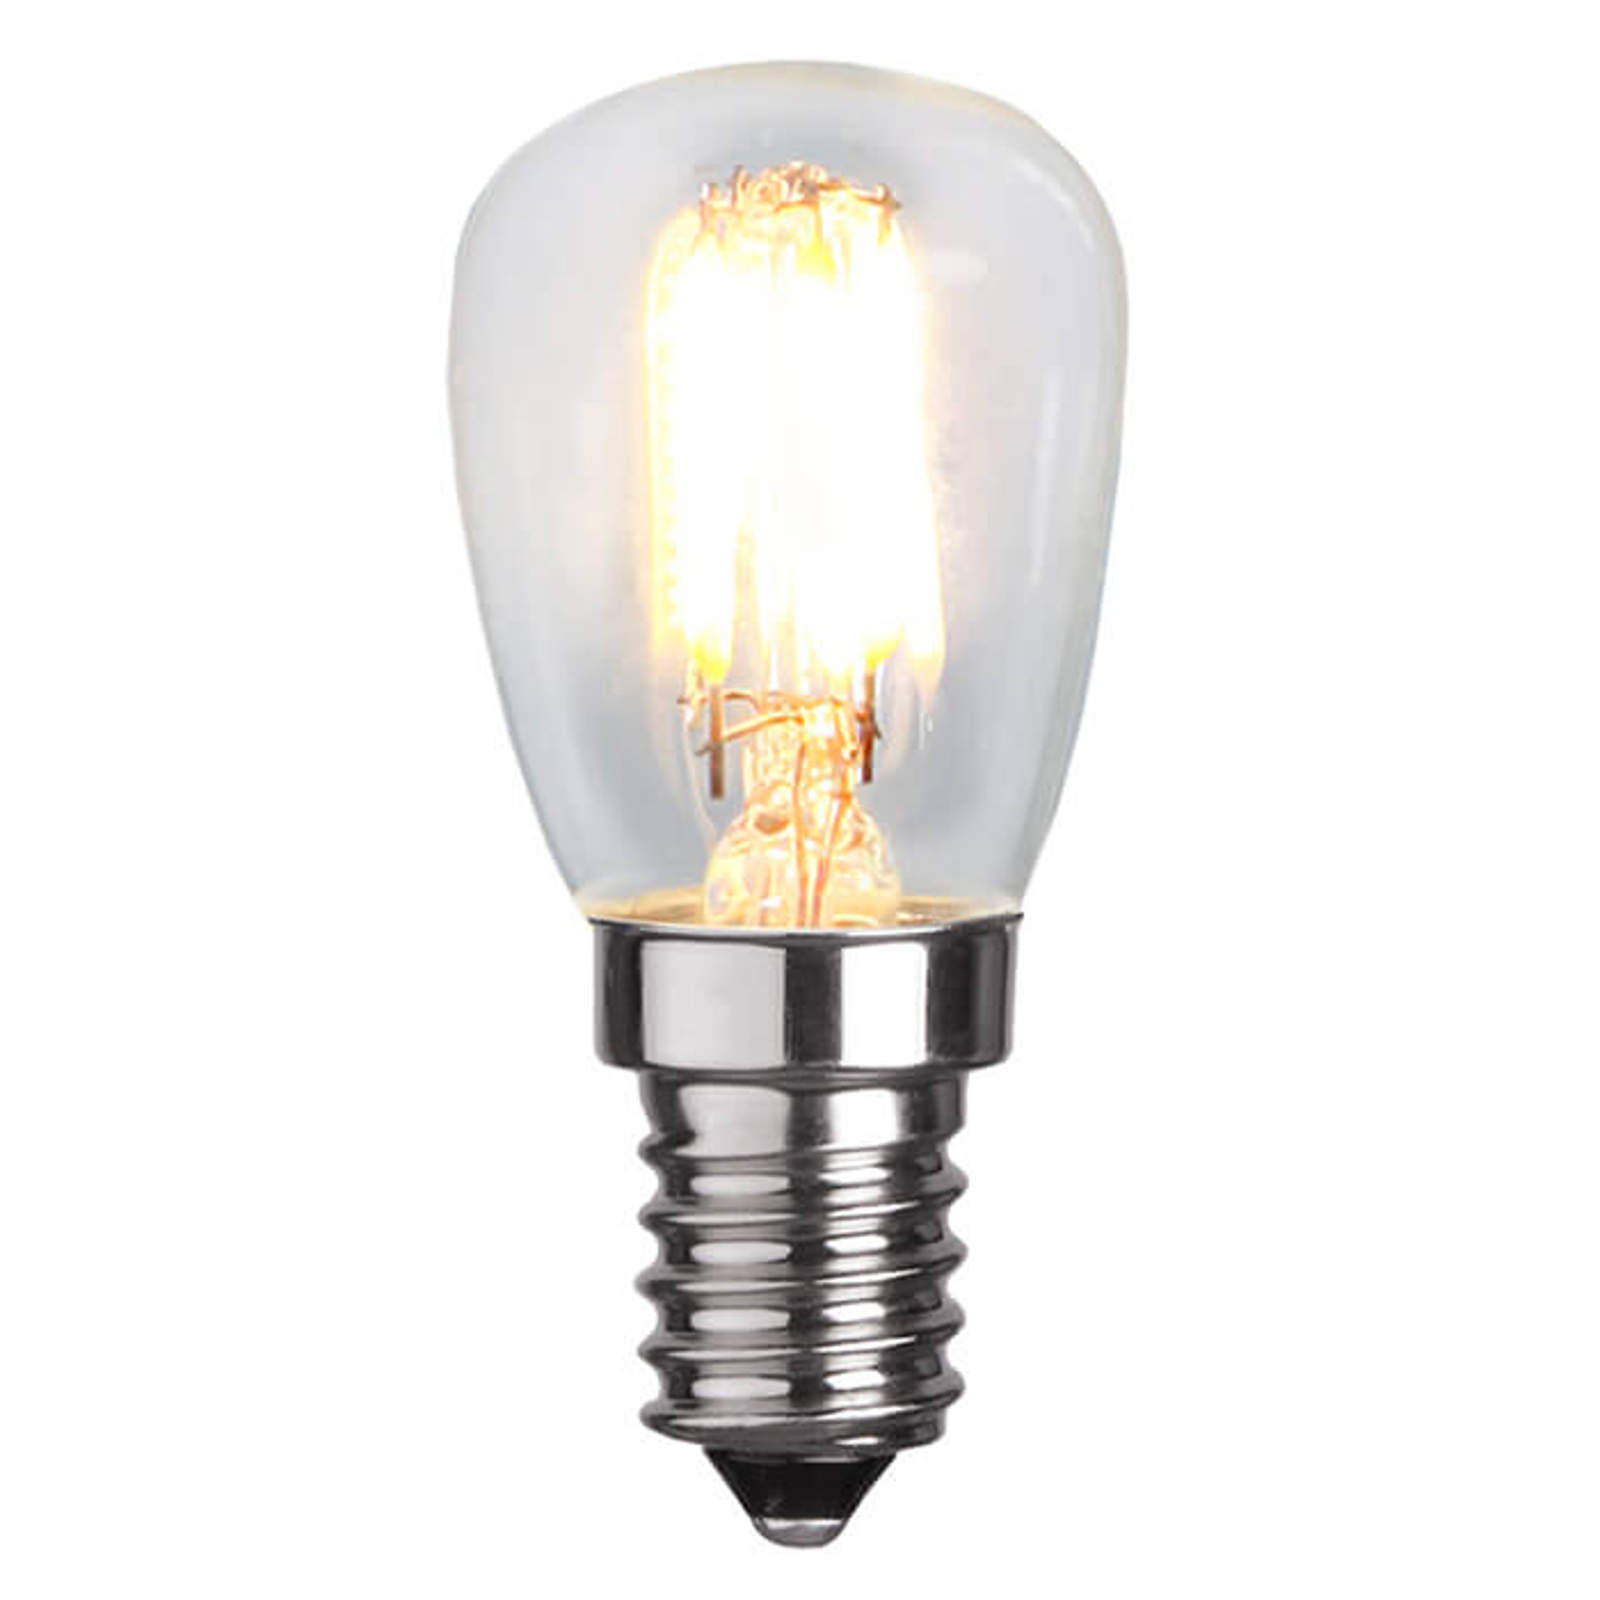 E14 2,8W 827 LED-Lampe, dimmbar